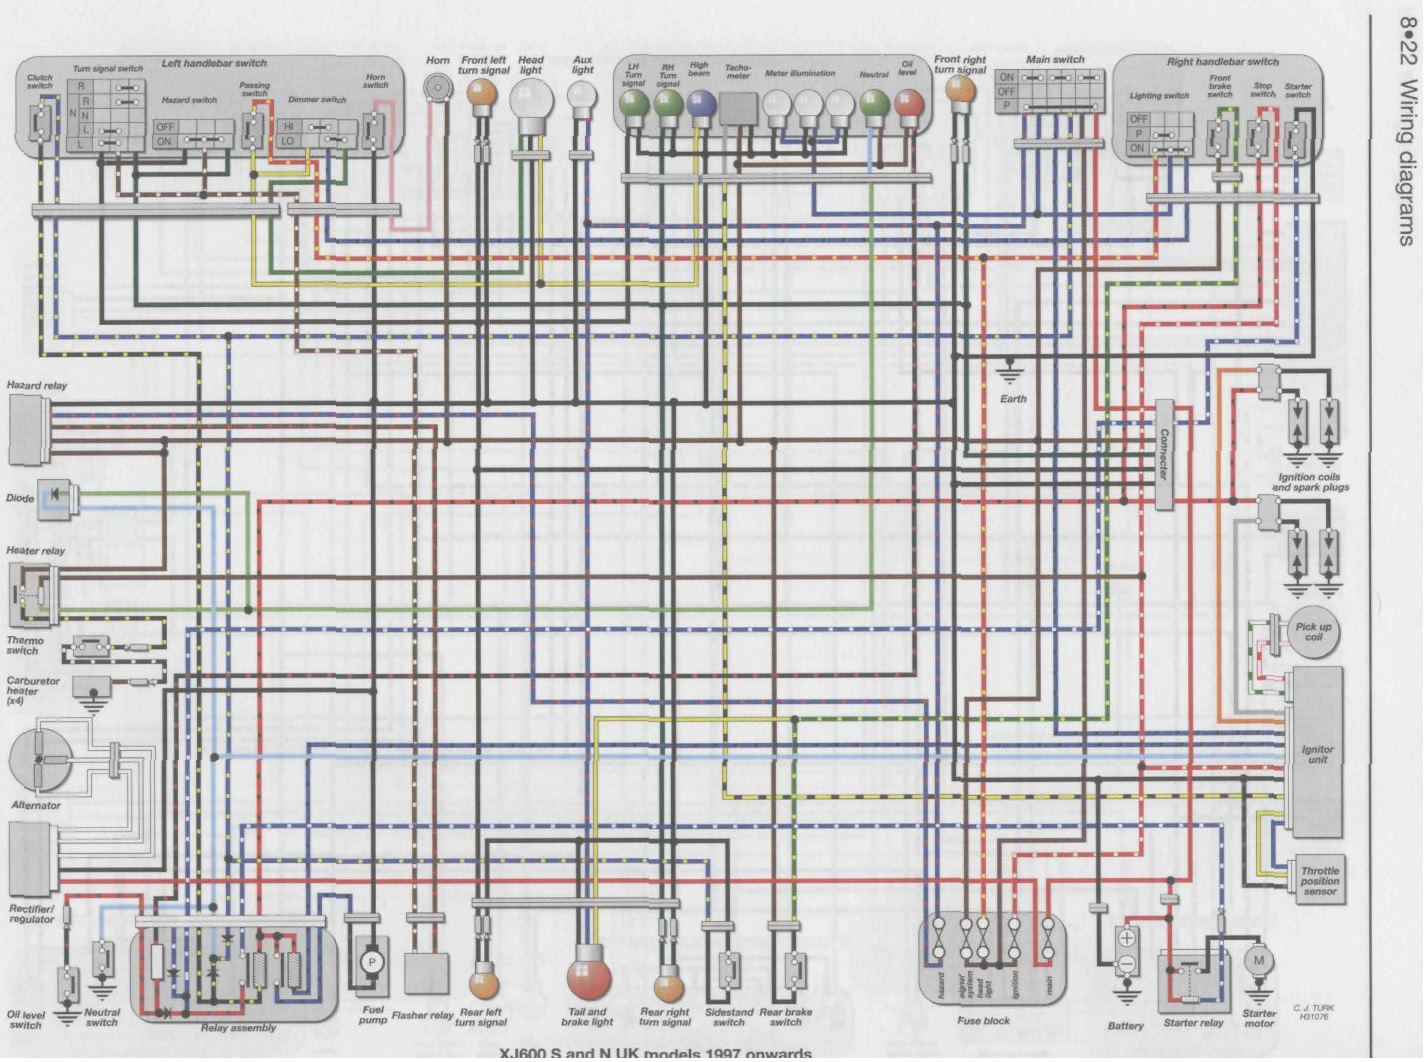 hight resolution of yamaha xj600 wiring diagram modern design of wiring diagram u2022 xj600 wiring diagram xj 600 wiring diagram